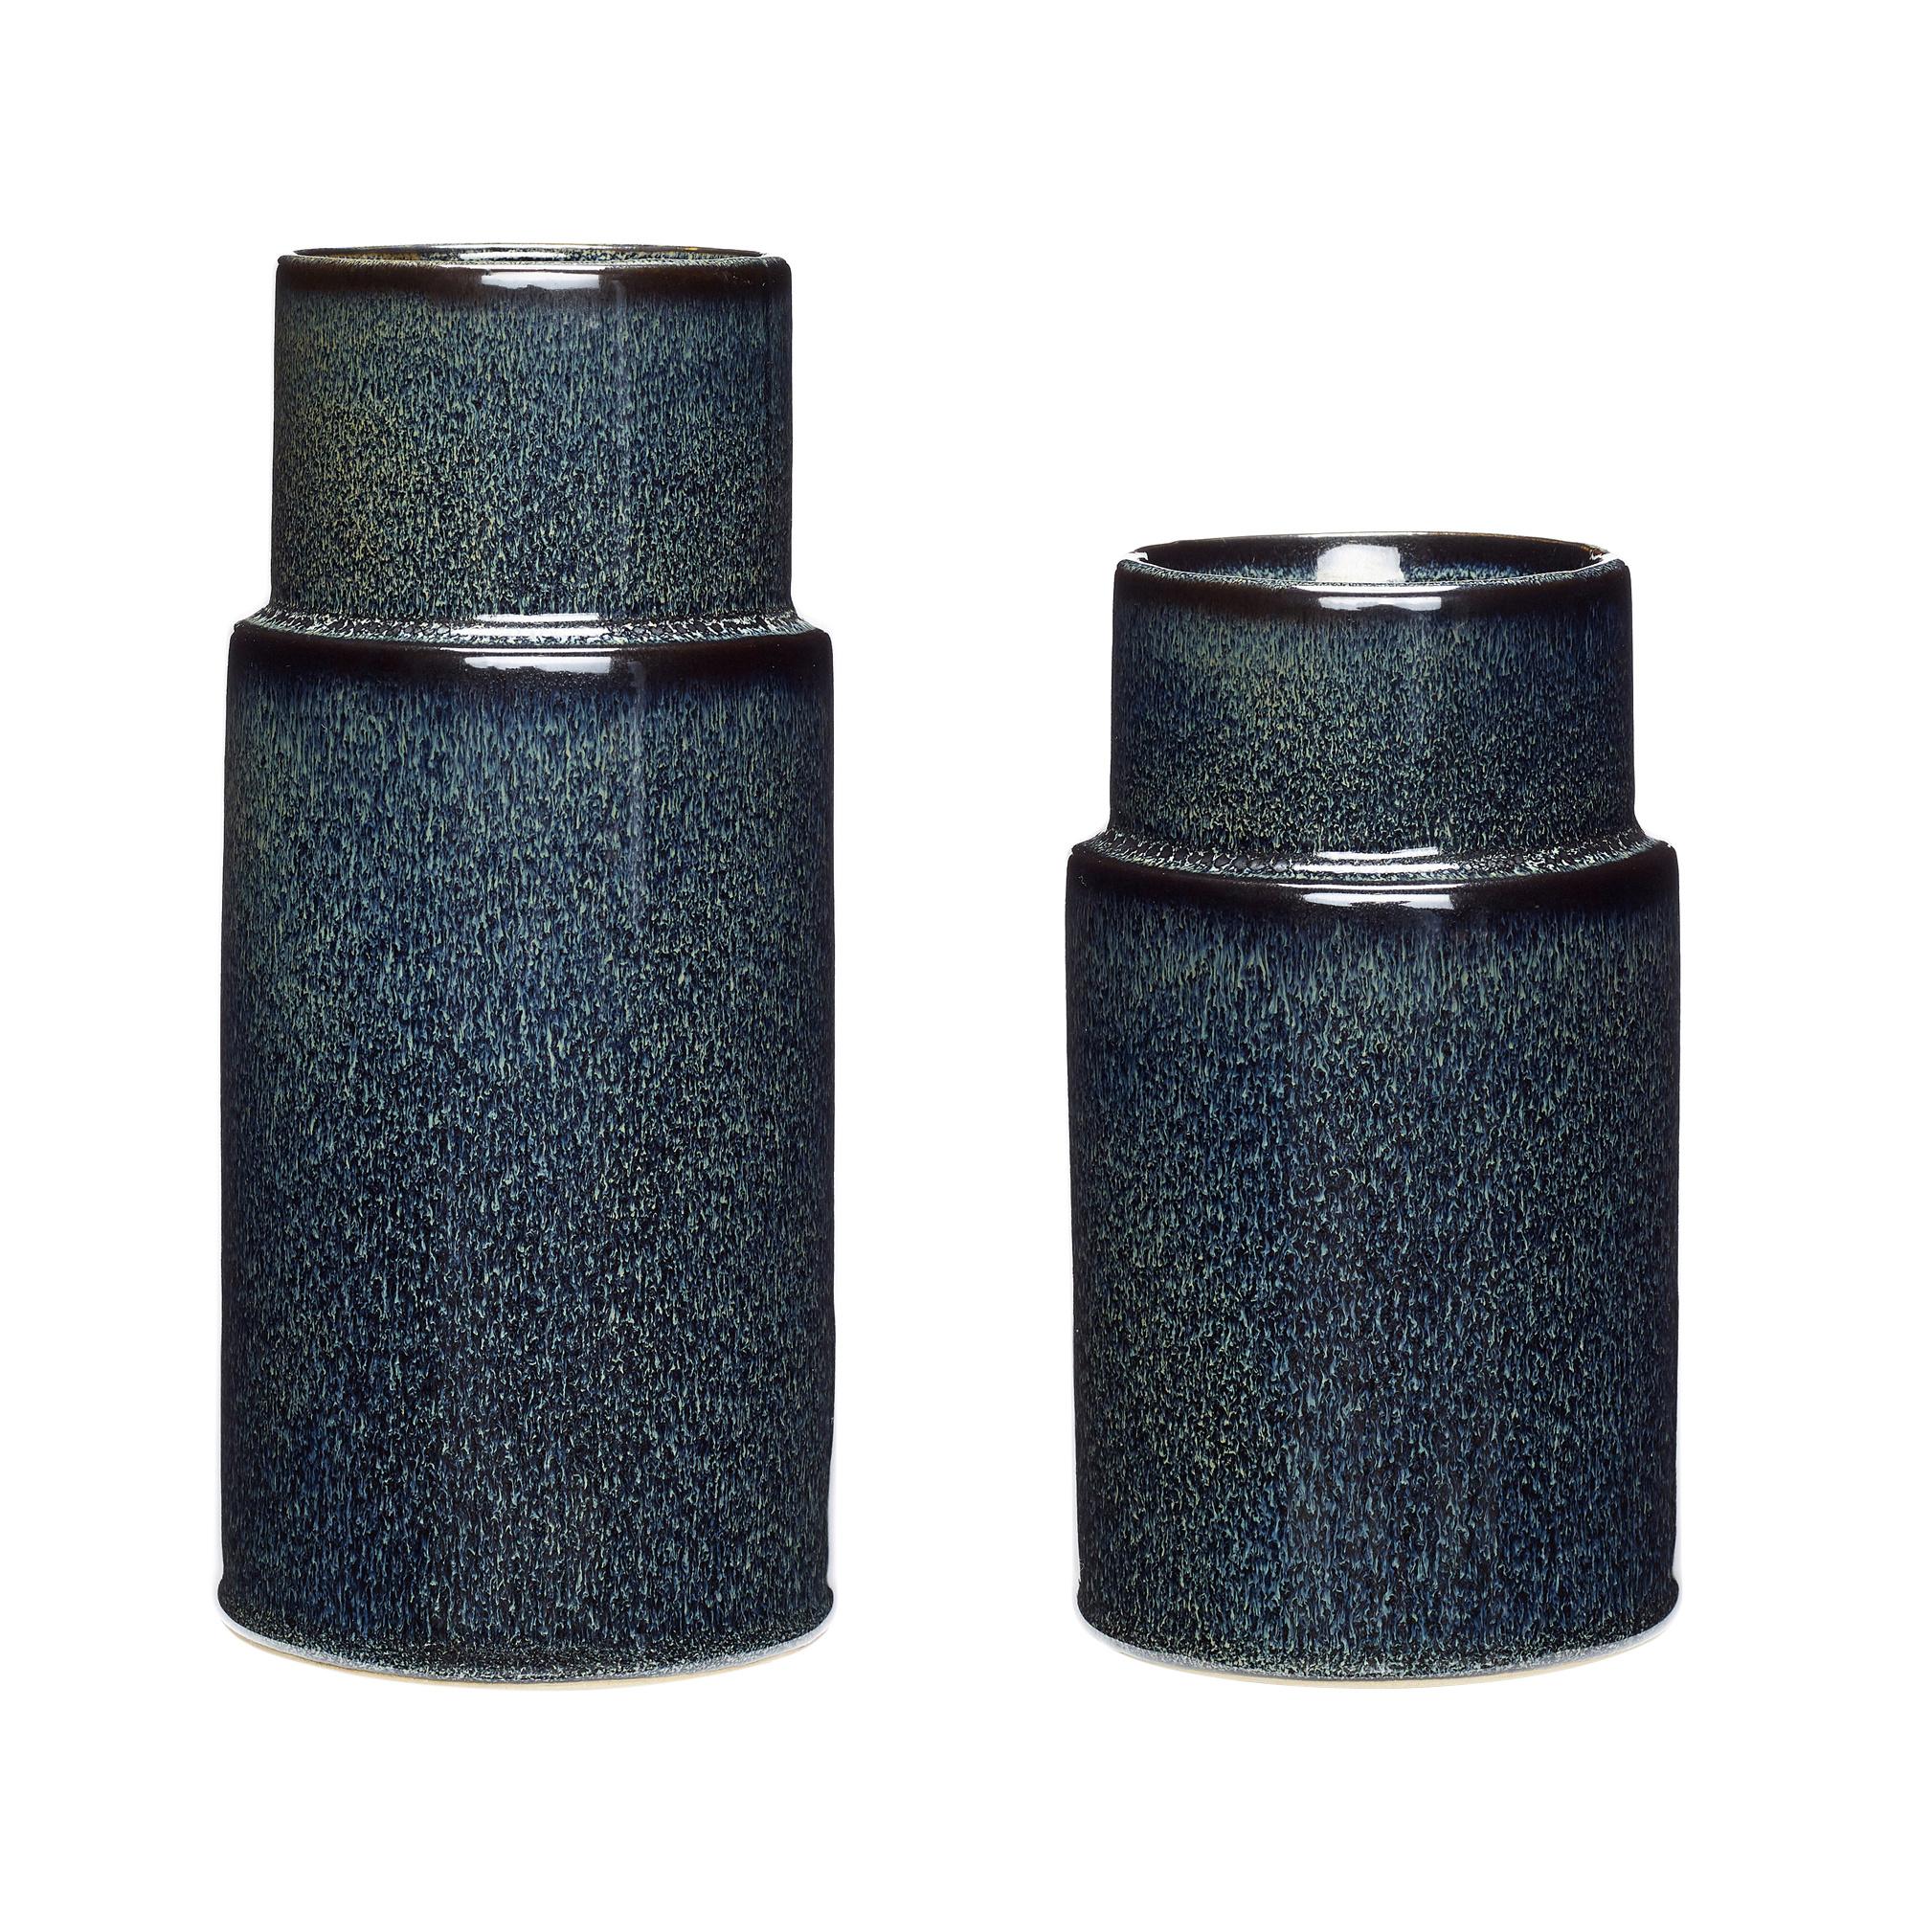 Hubsch Vaas, keramiek, blauw, set van 2